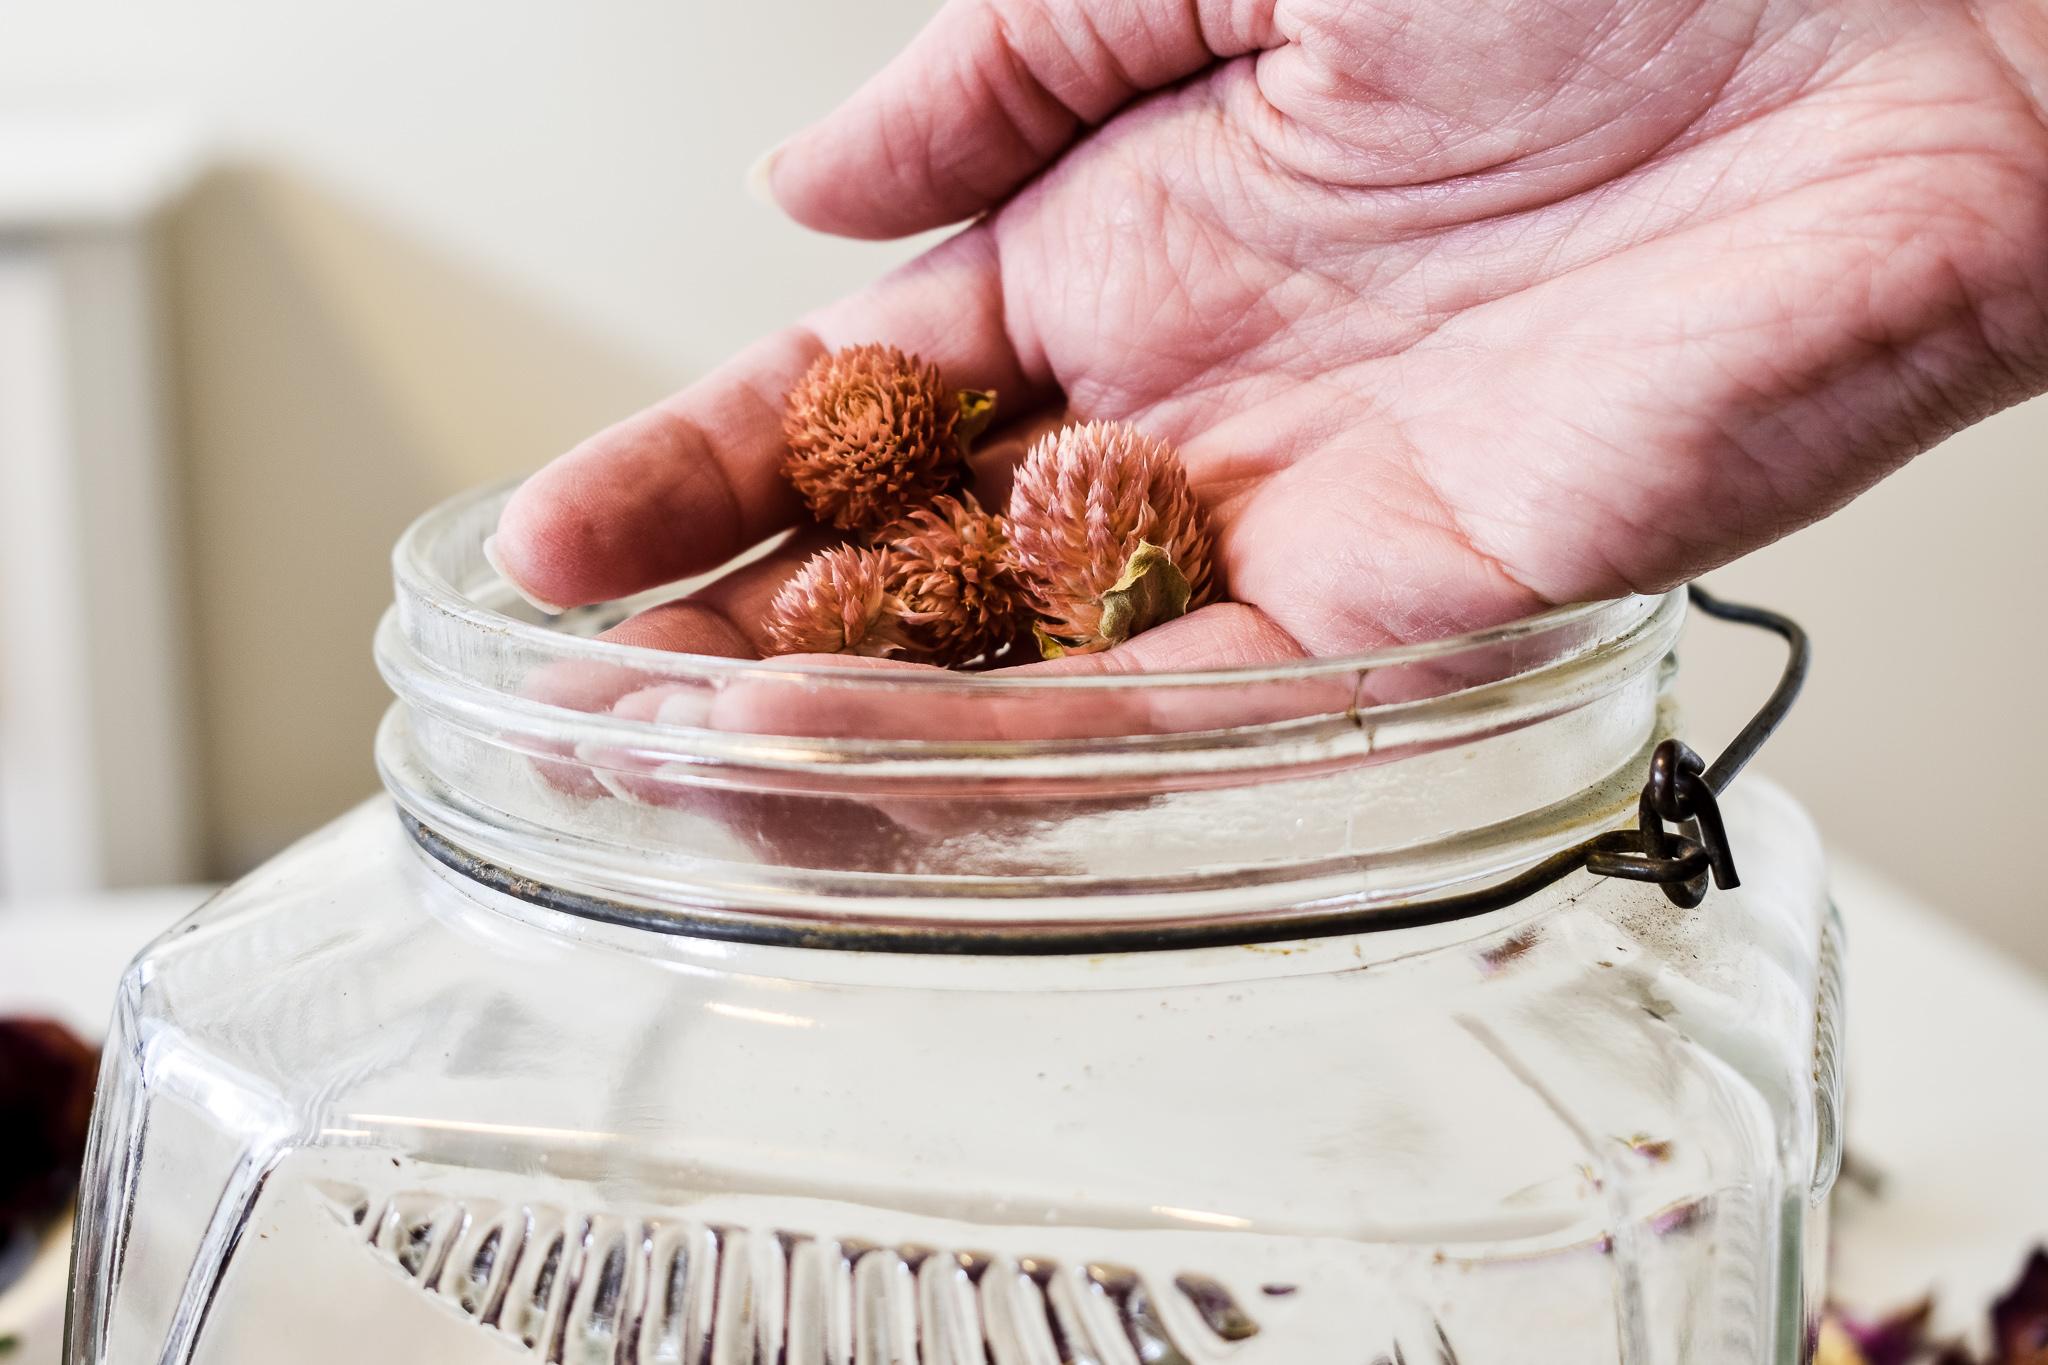 putting dried amaranth into a glass jar